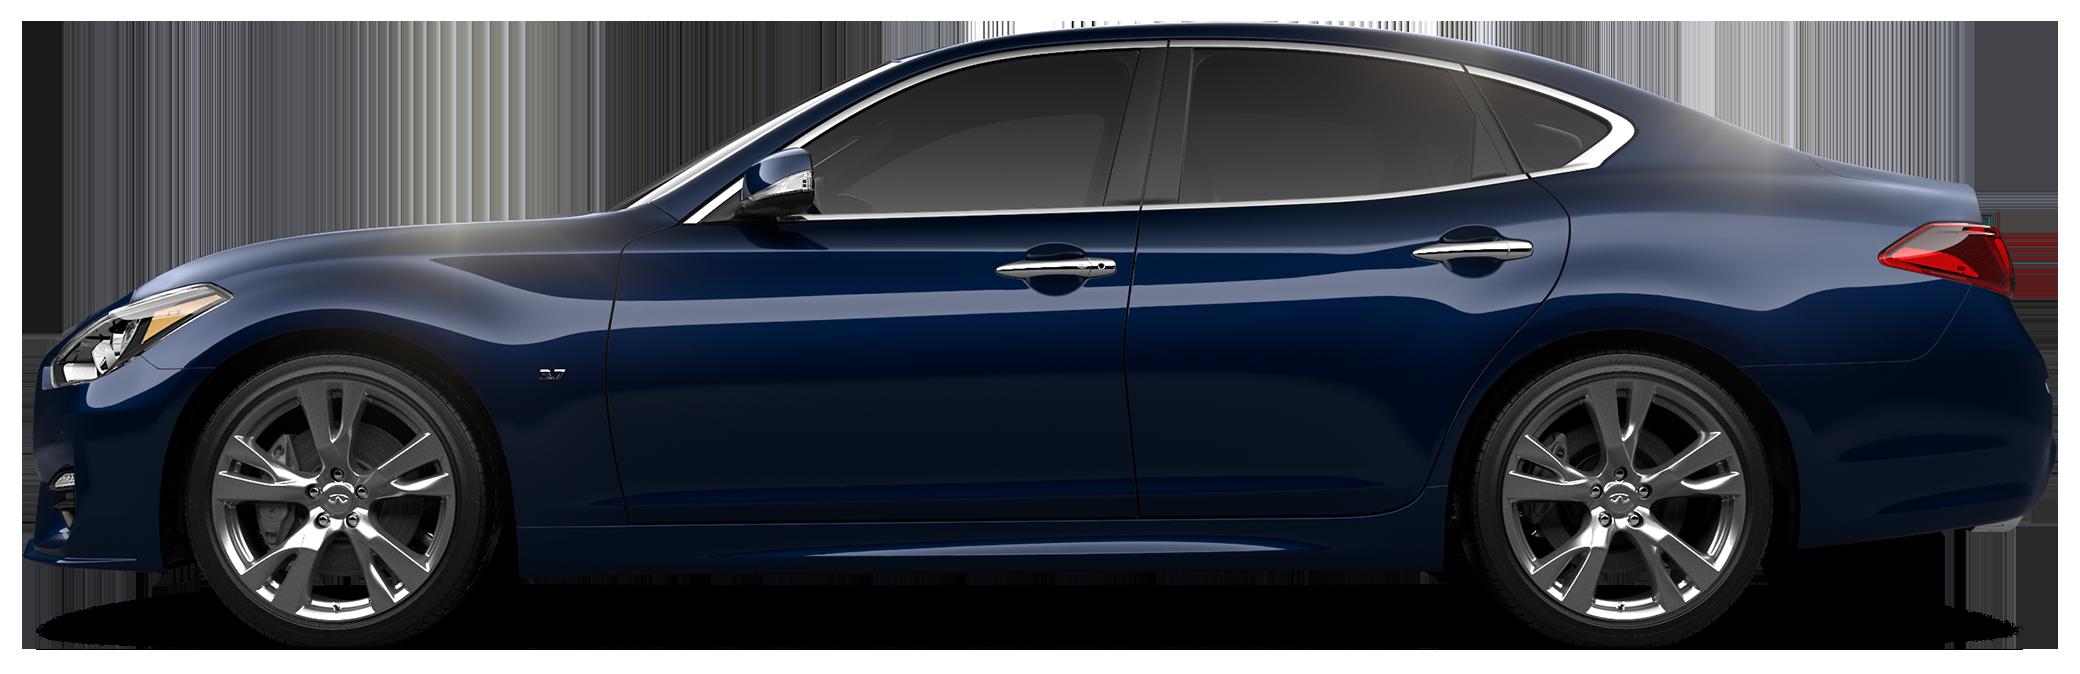 2019 INFINITI Q70 Sedan 5.6X LUXE